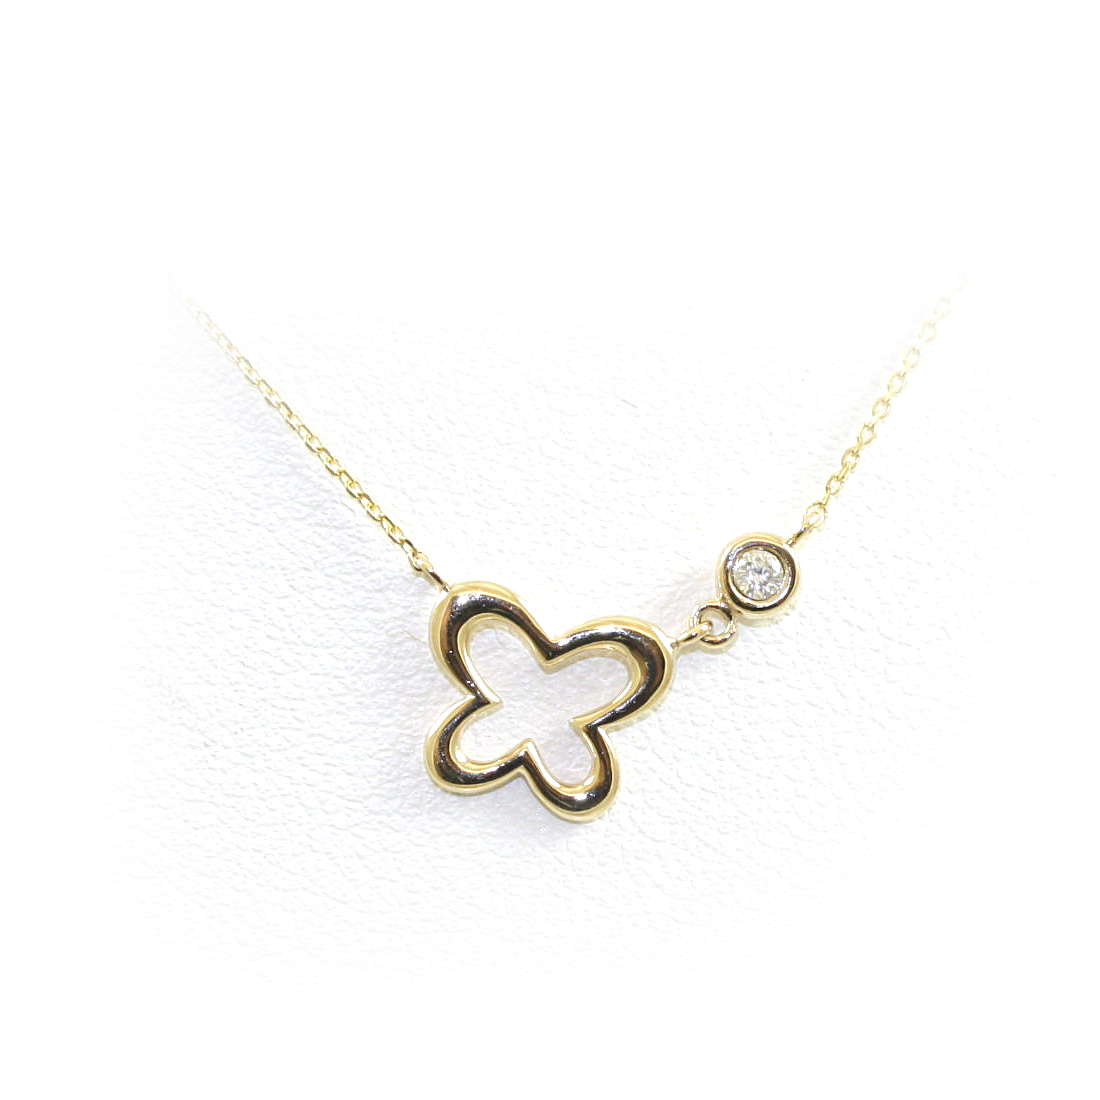 14 Karat Yellow Gold Open Clover Diamond Necklace